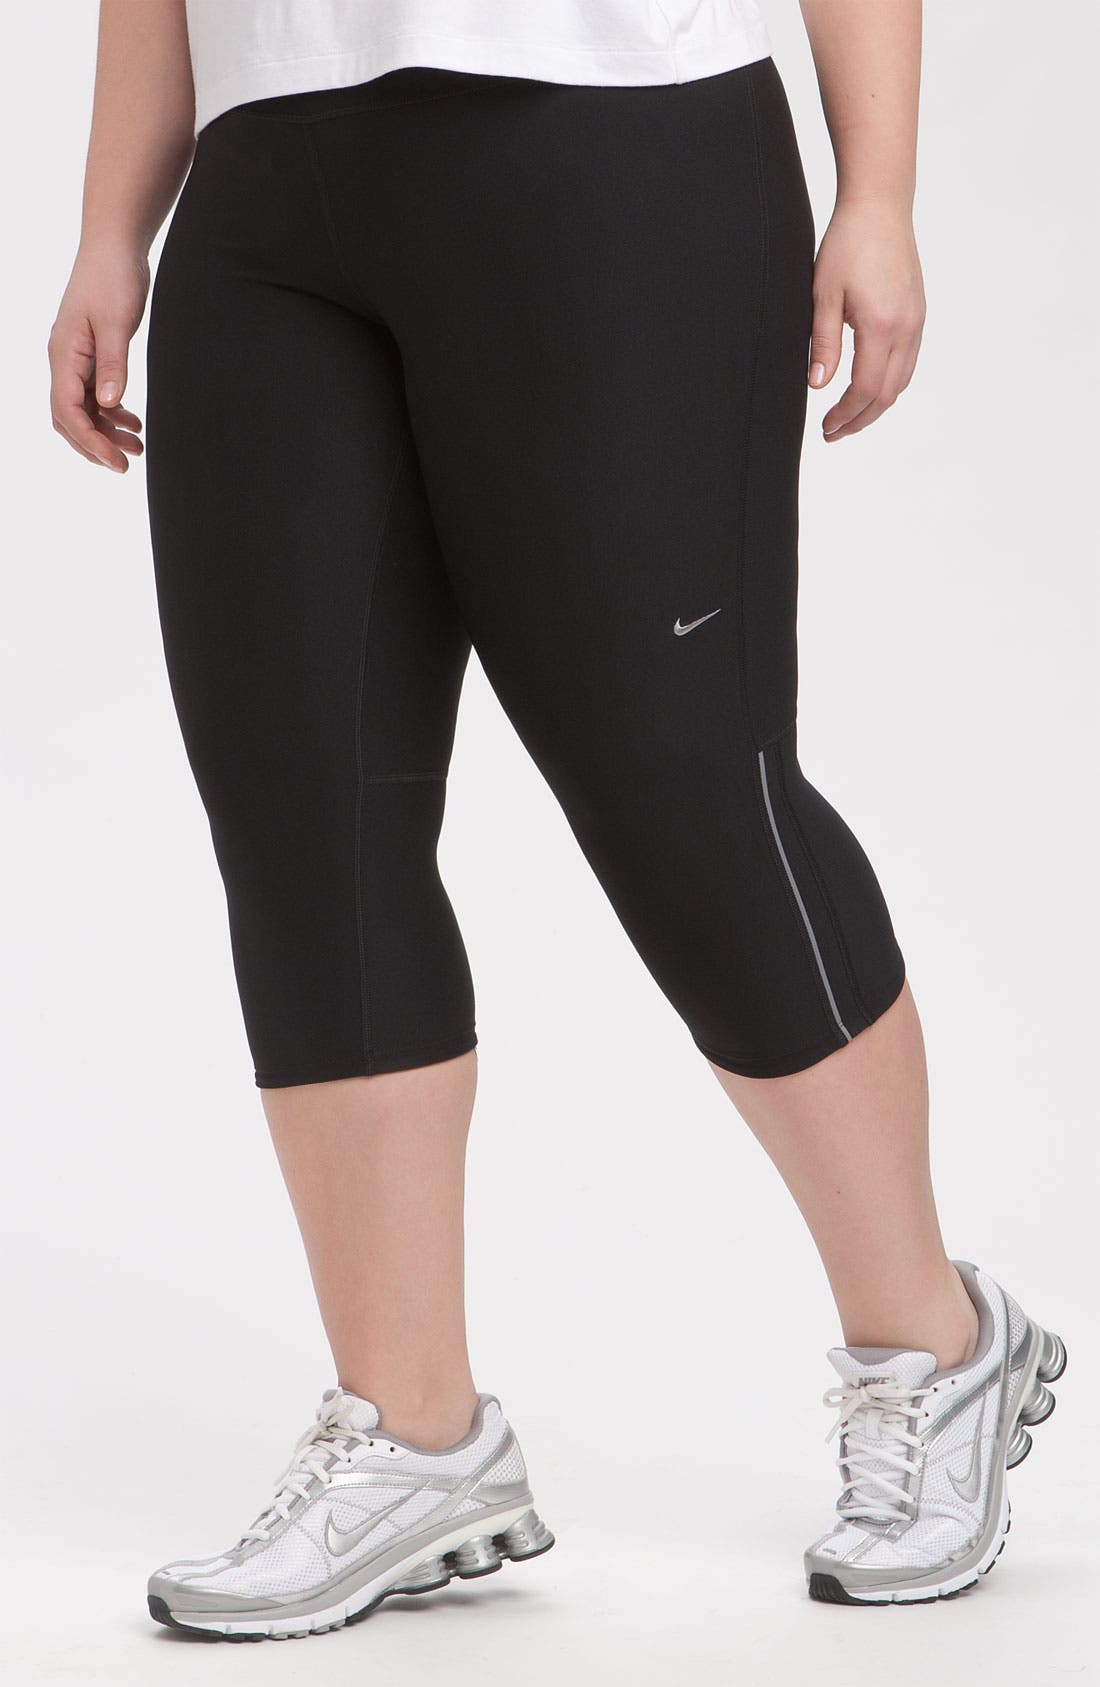 Alternate Image 1 Selected - Nike 'Filament' Capris (Plus Size)